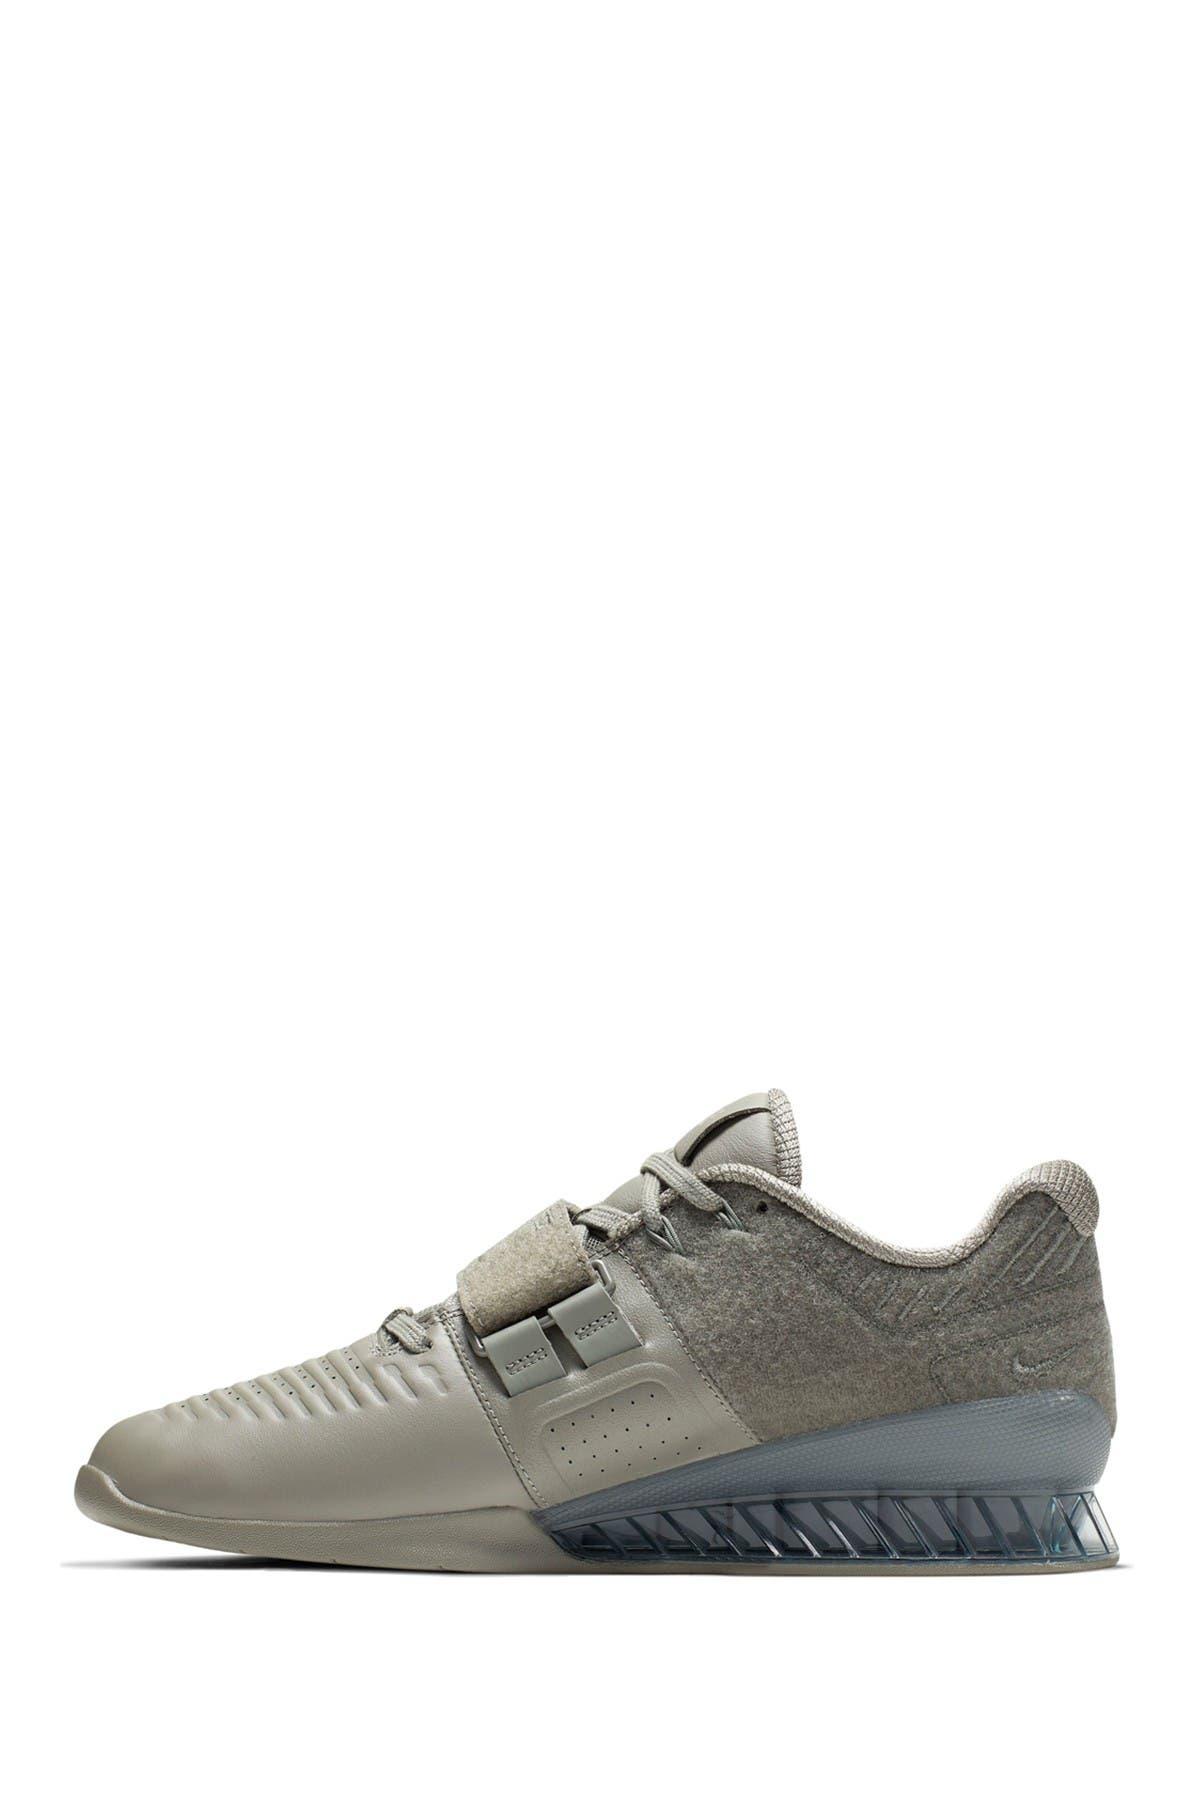 reporte Sede Patético  Nike | Romaleos 3 XD Patch Training Shoe | Nordstrom Rack